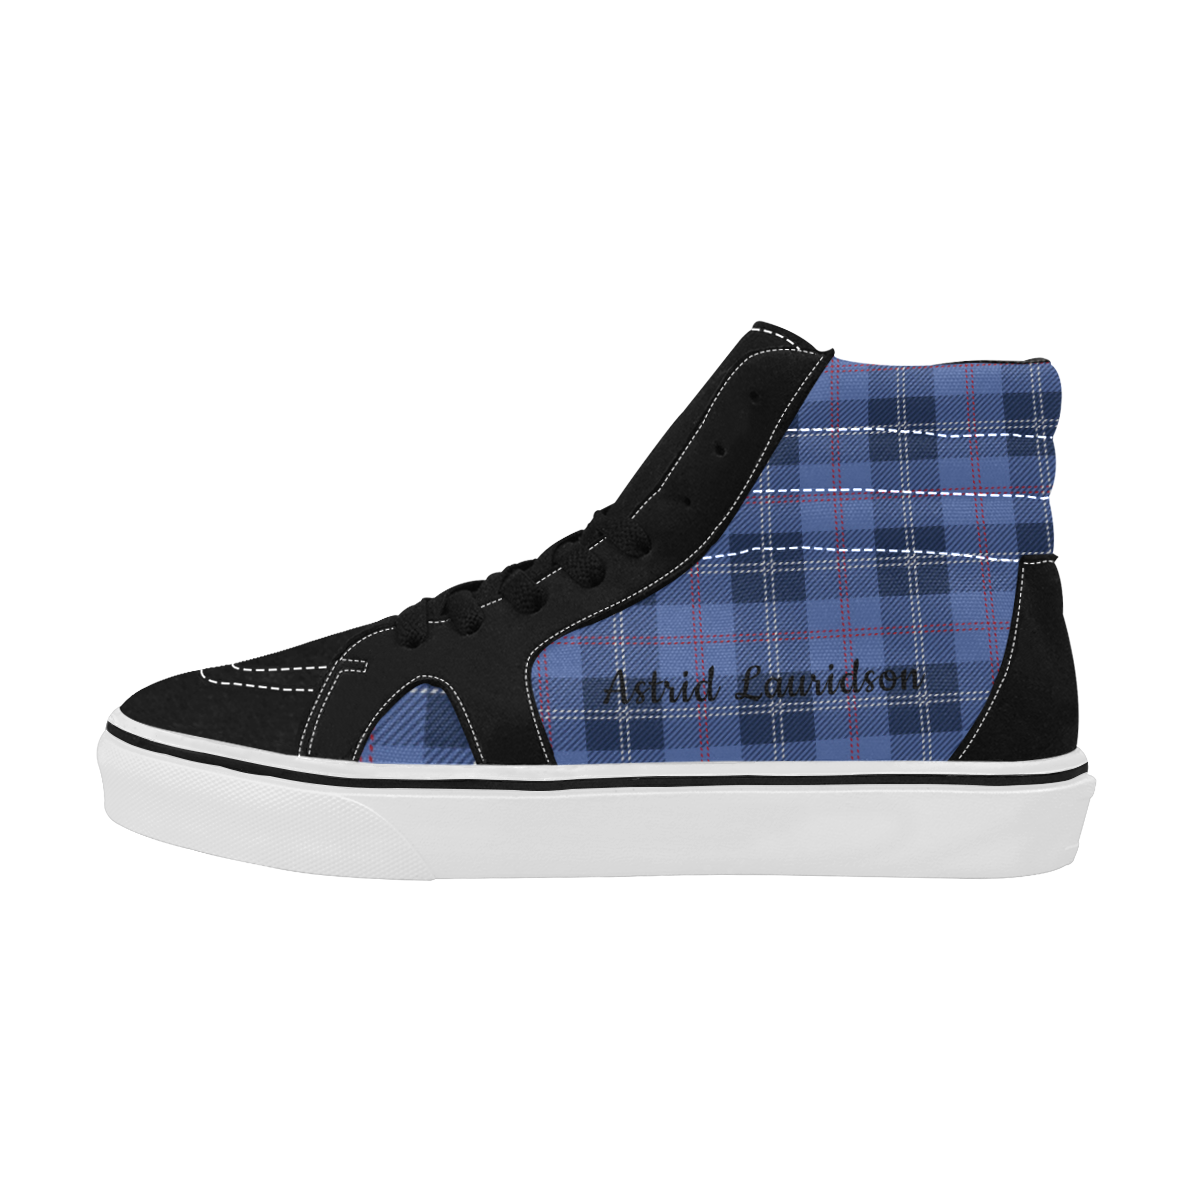 17tt Women's High Top Skateboarding Shoes (Model E001-1)